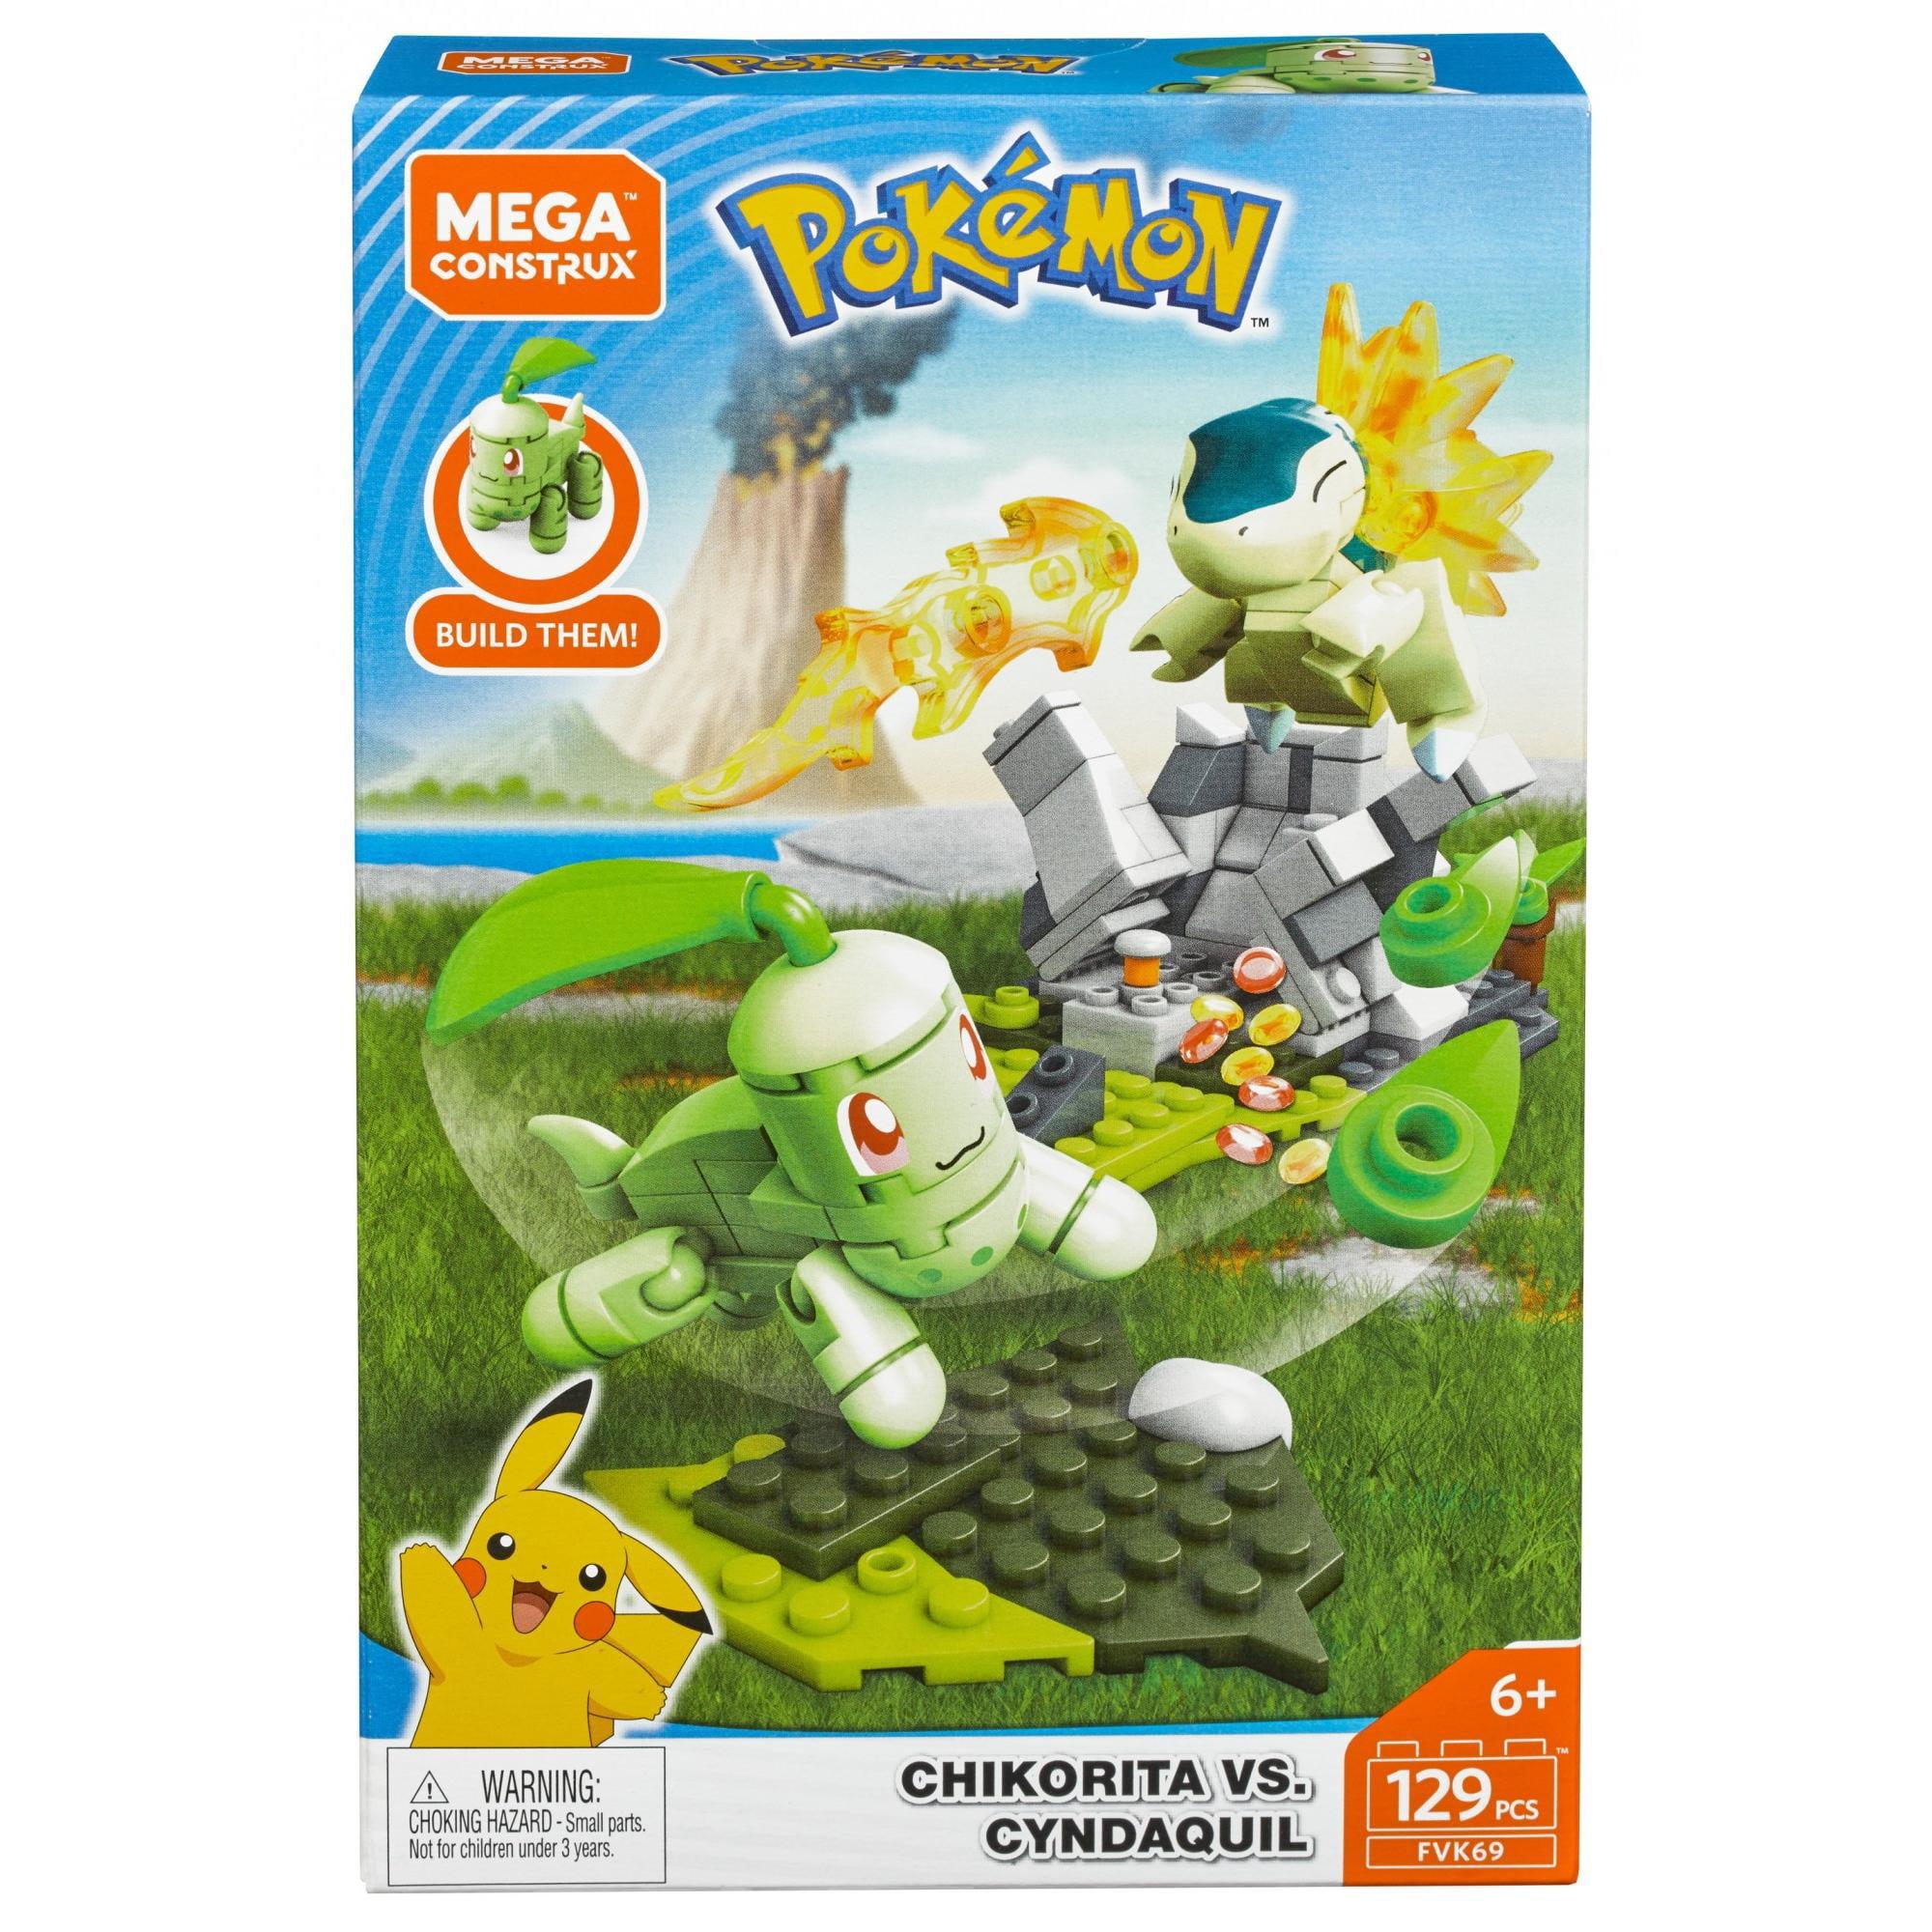 Mega Construx Pokemon Chikorita Vs. Cyndaquil by Mattel